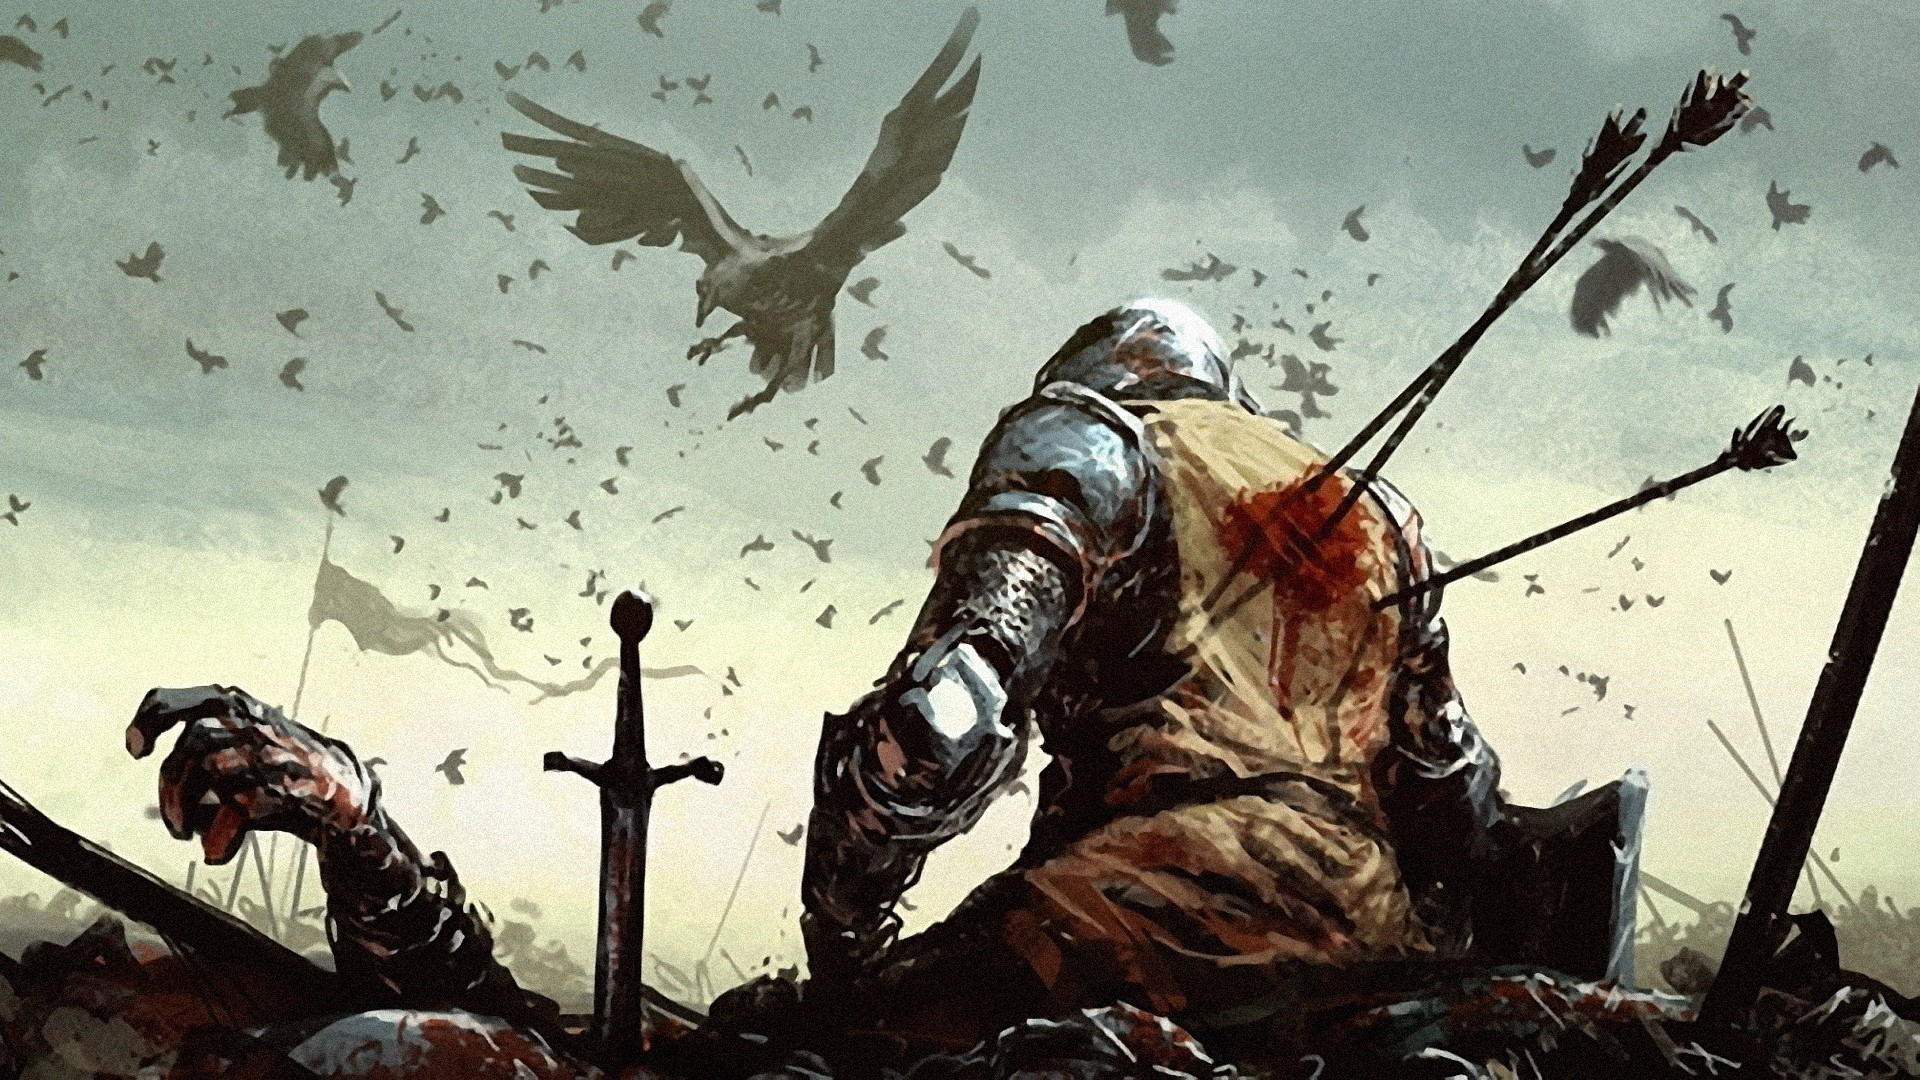 Battle · Battle Wallpaper